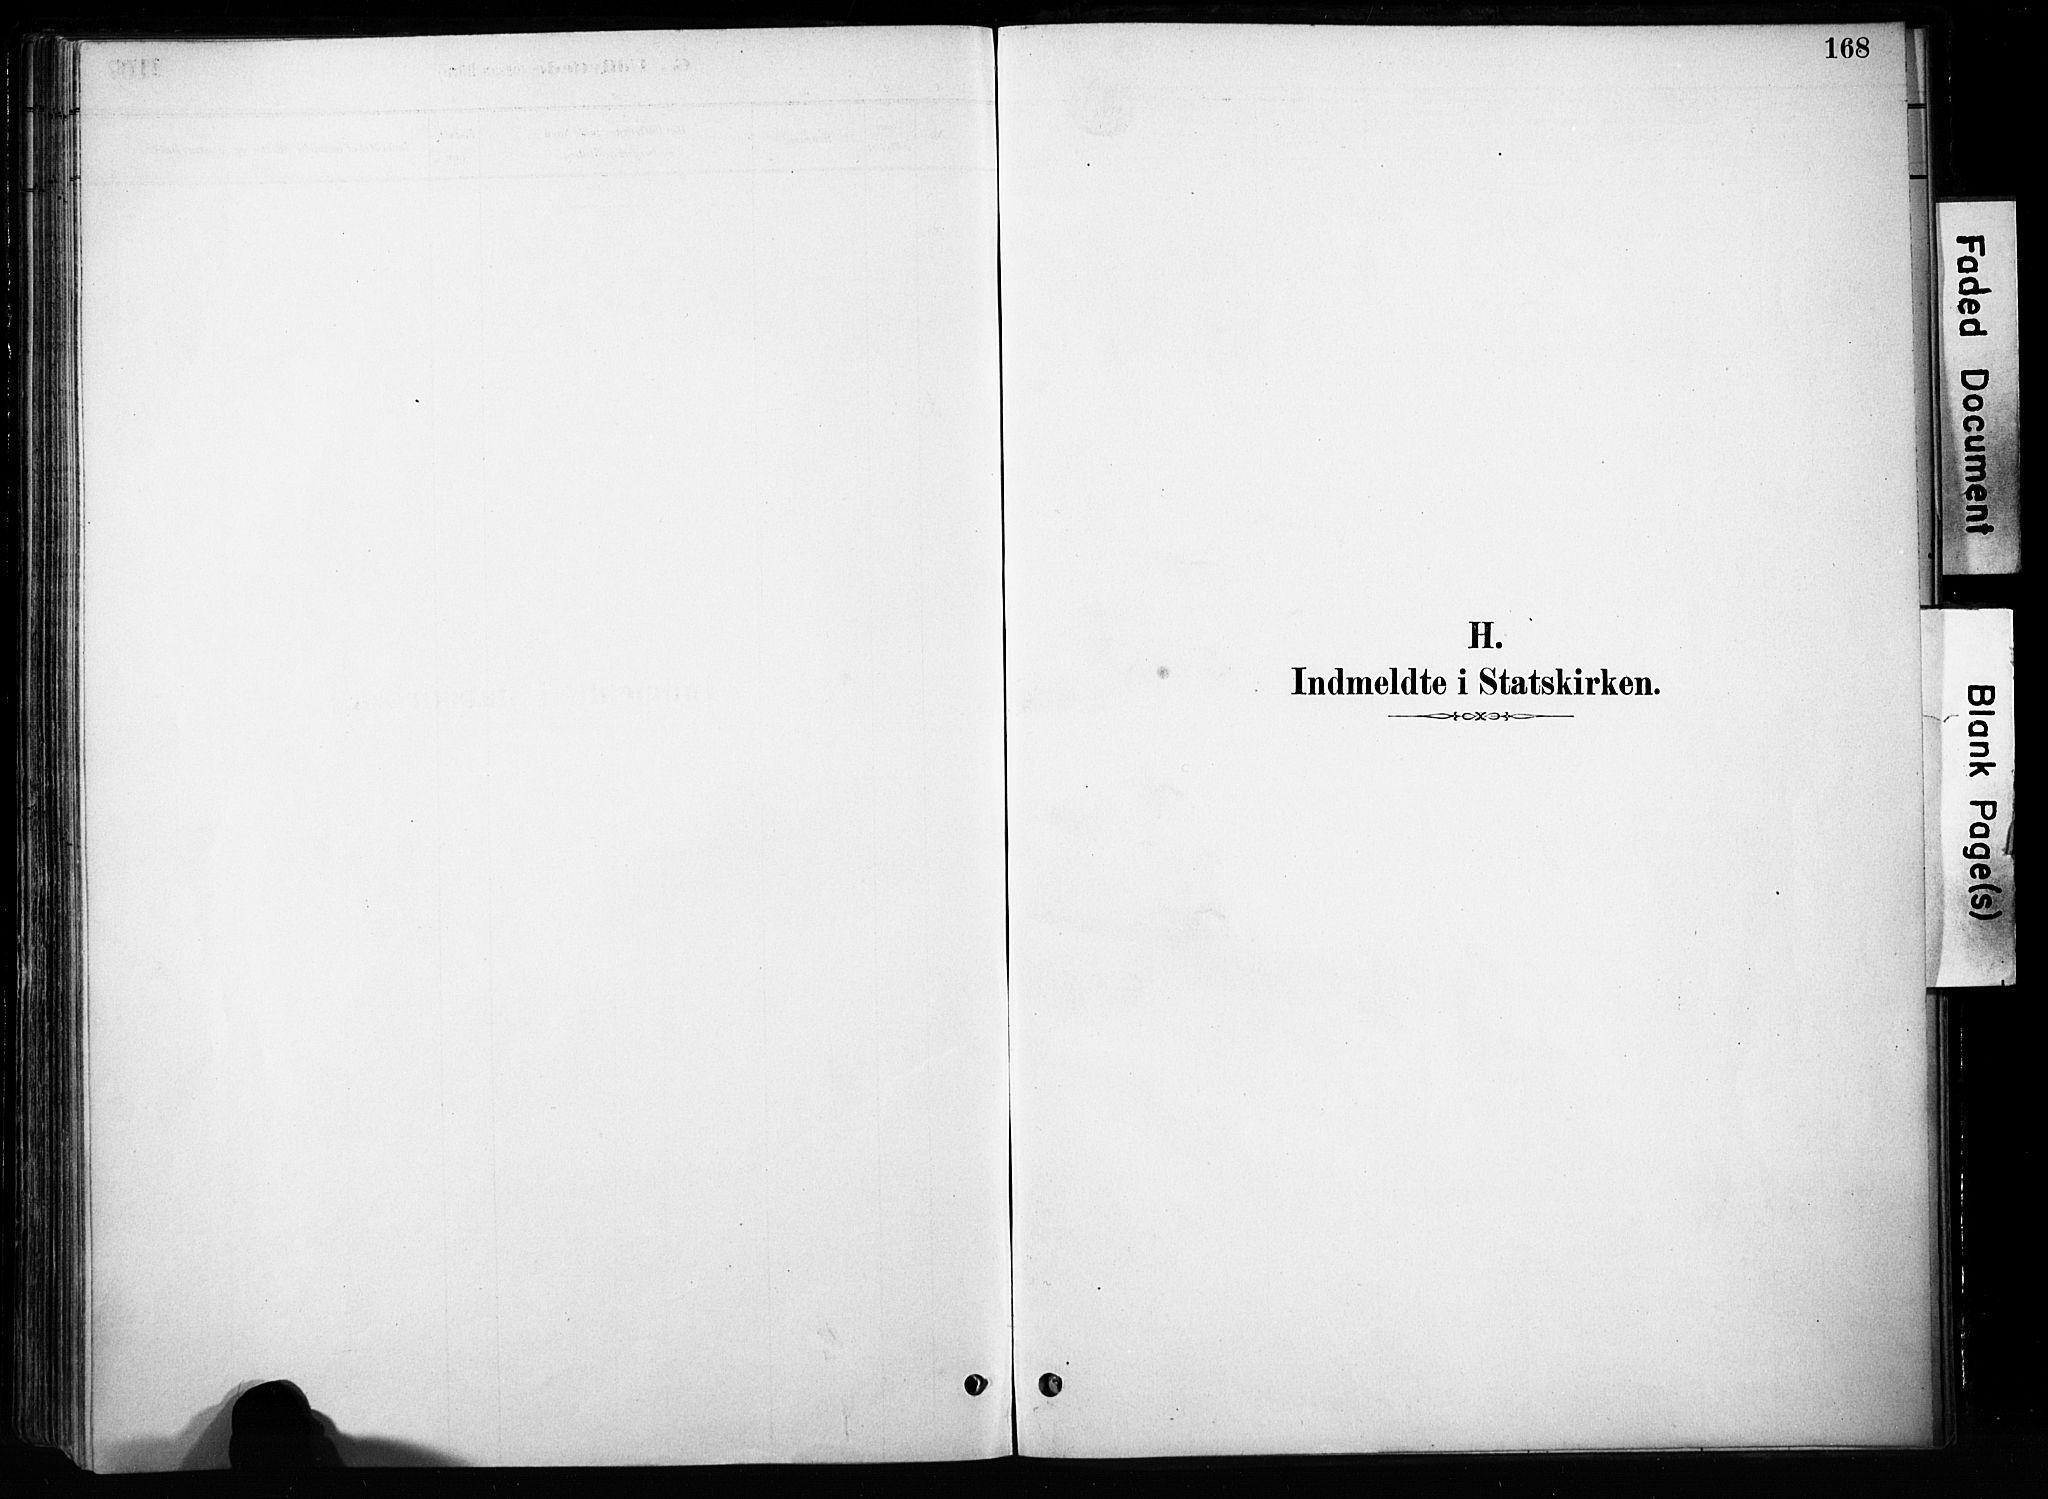 SAH, Skjåk prestekontor, Ministerialbok nr. 4, 1880-1904, s. 168